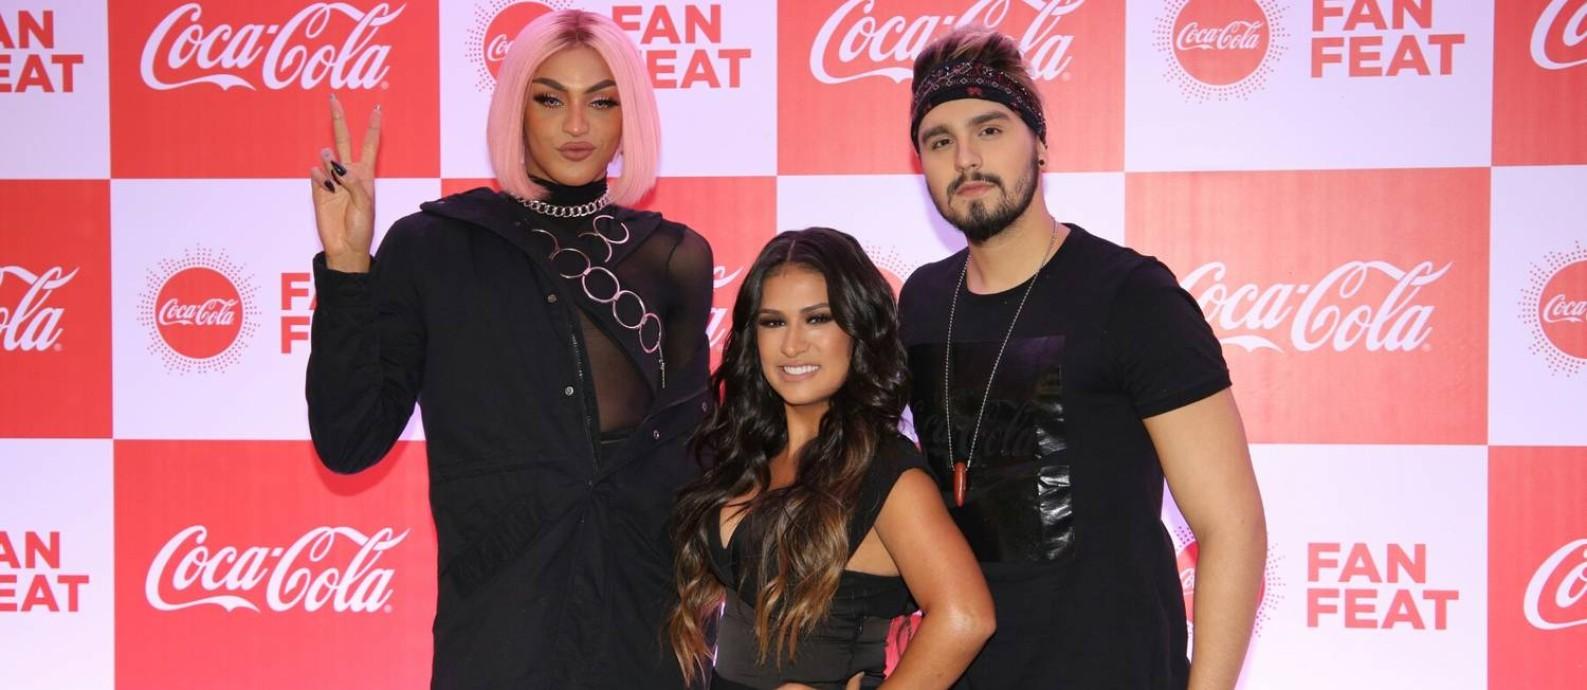 Pabllo Vittar, Simone e Luan Santana no lançamento do clipe 'Hasta la vista' Foto: Deividi Correa / AgNews